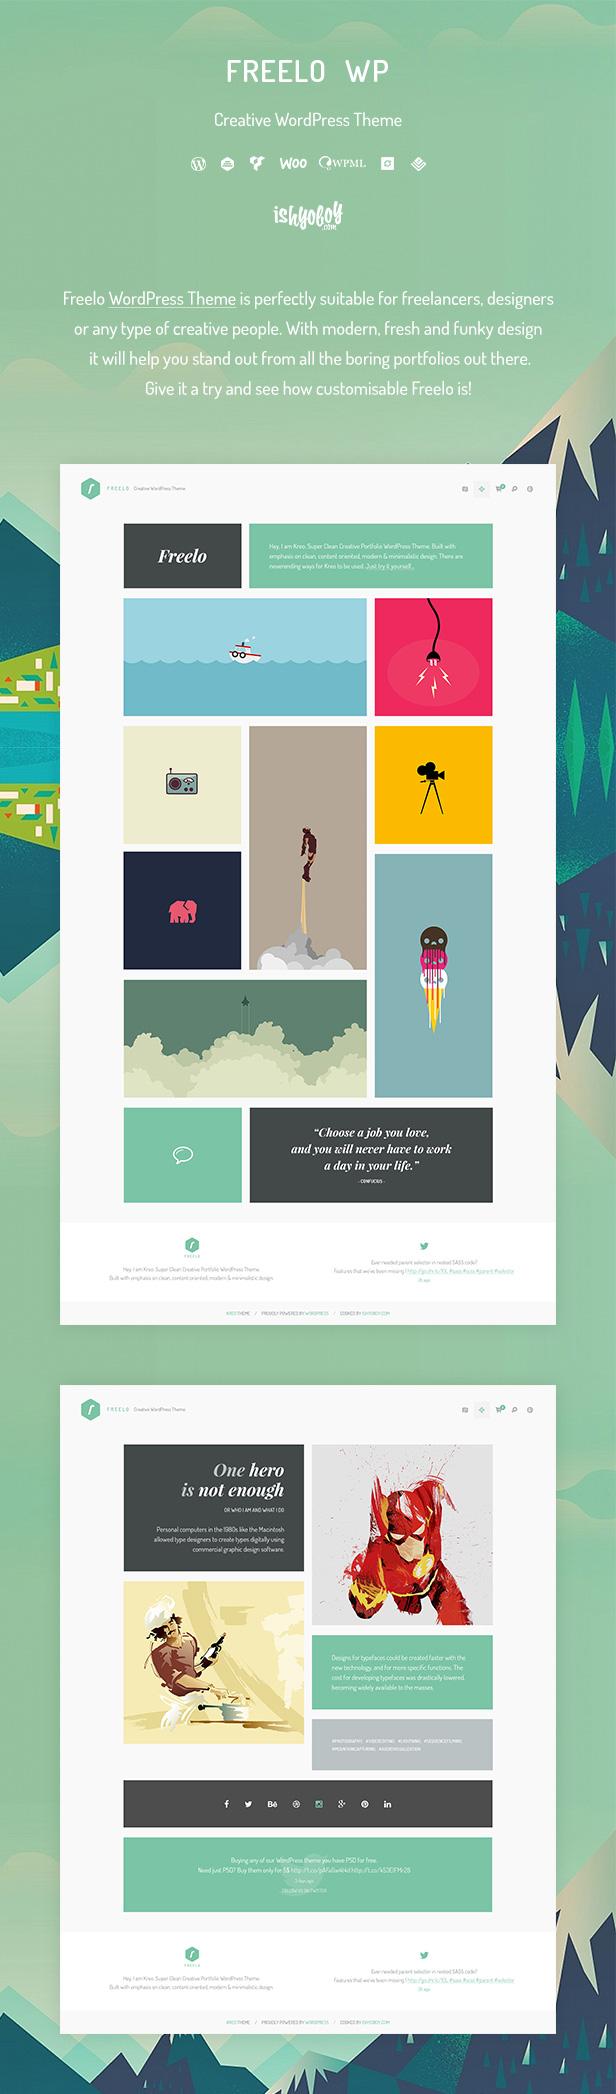 IshYoBoy | Freelo - Kreatives WordPress-Template